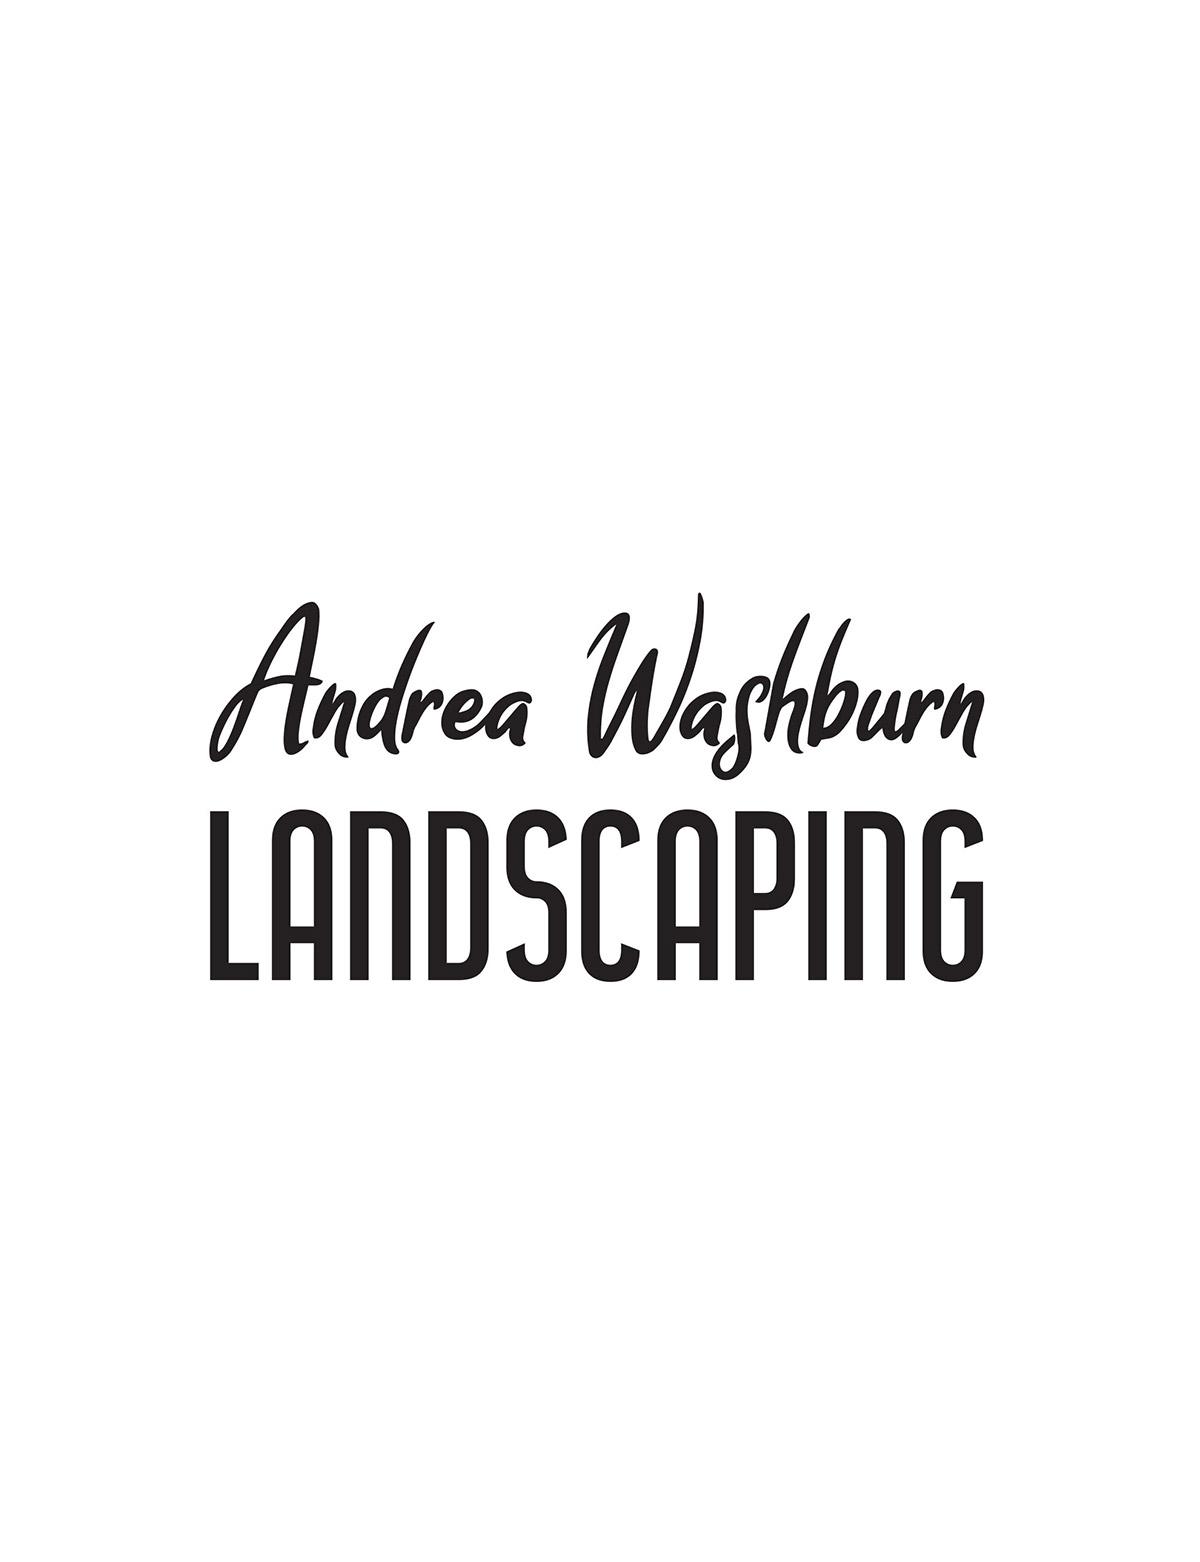 logo_andreawashburn.jpg